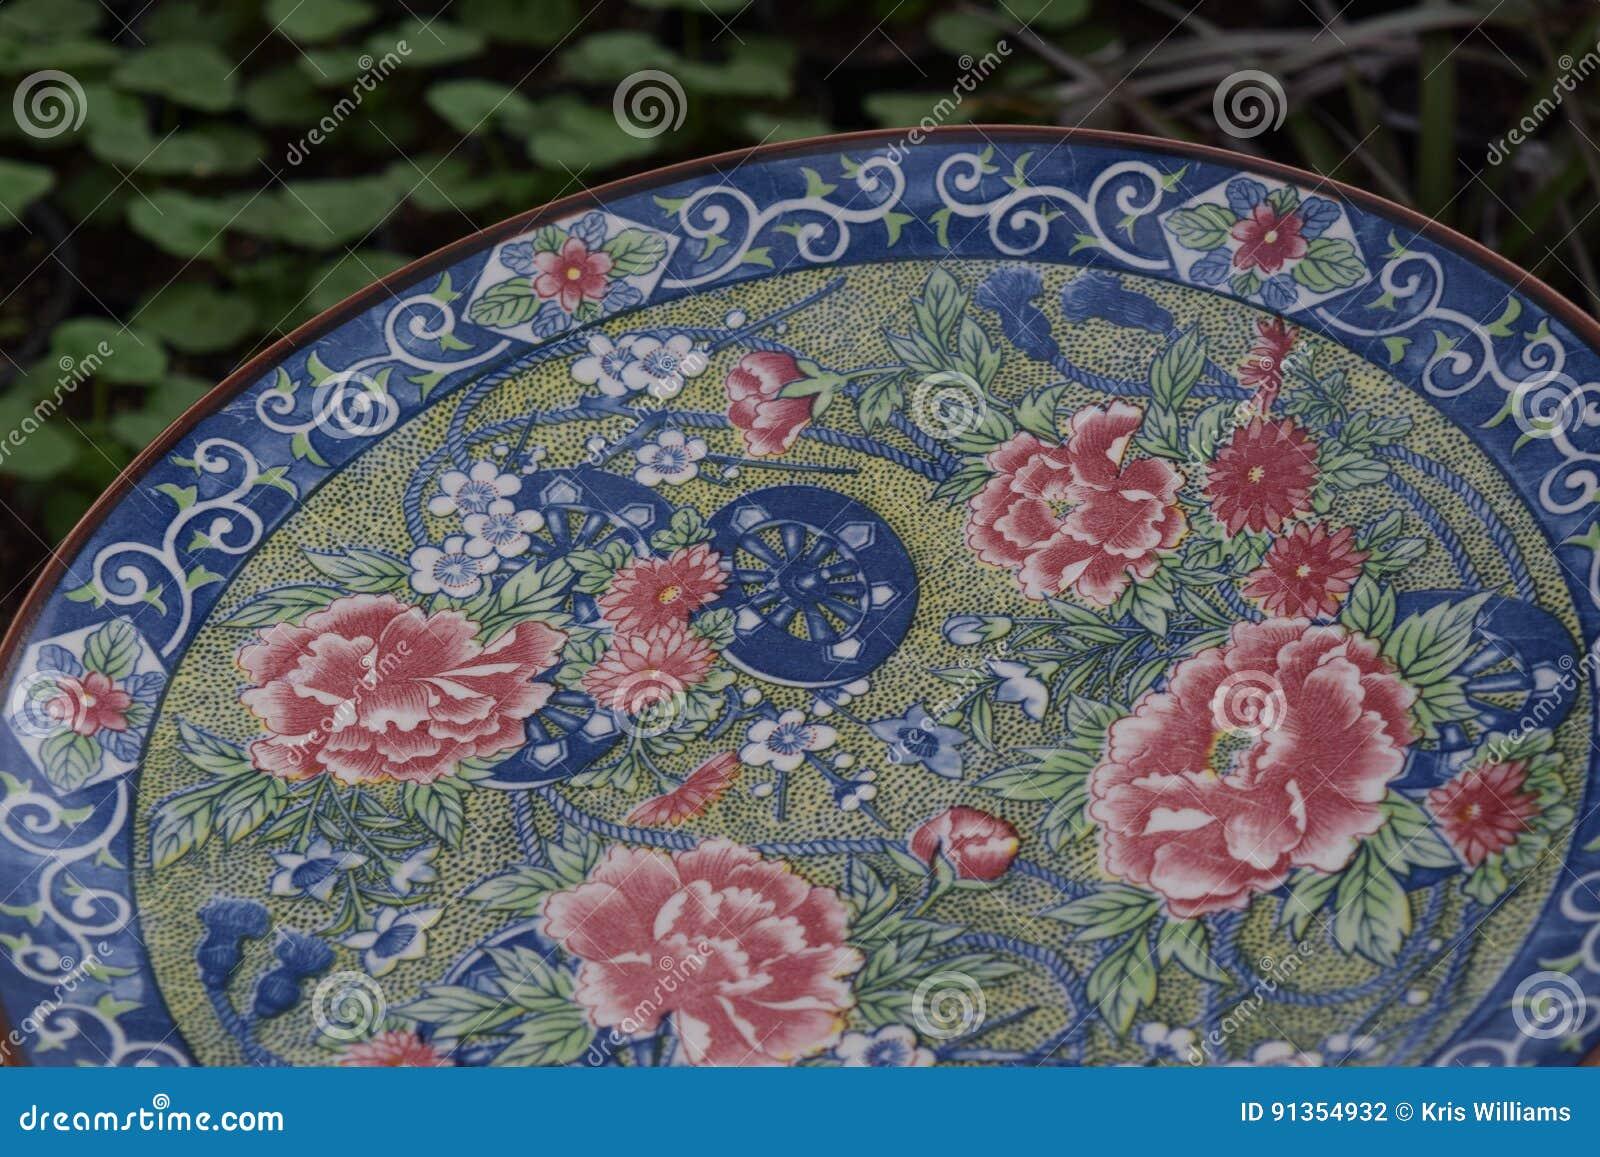 Elegant plate bird bath close-up